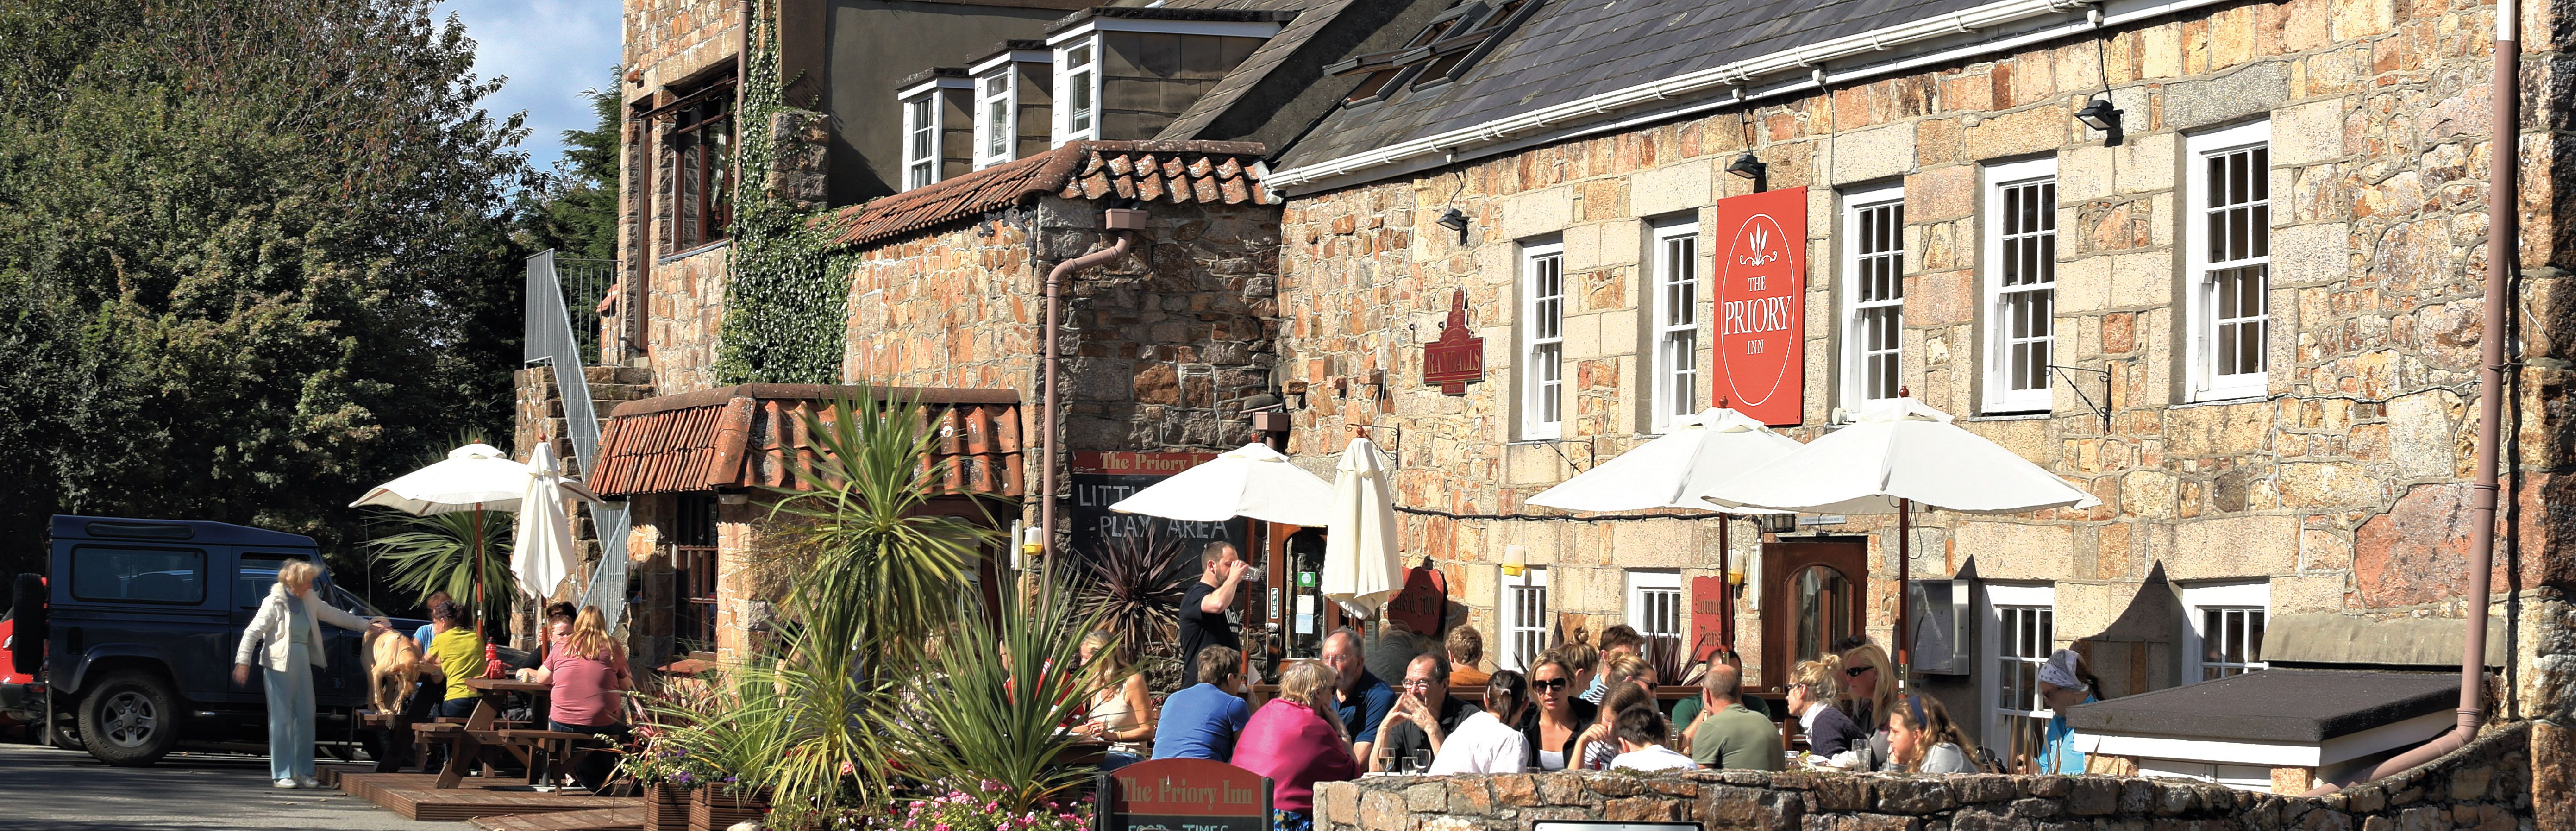 Randalls The Priory Inn Pub and Restaurant Jersey